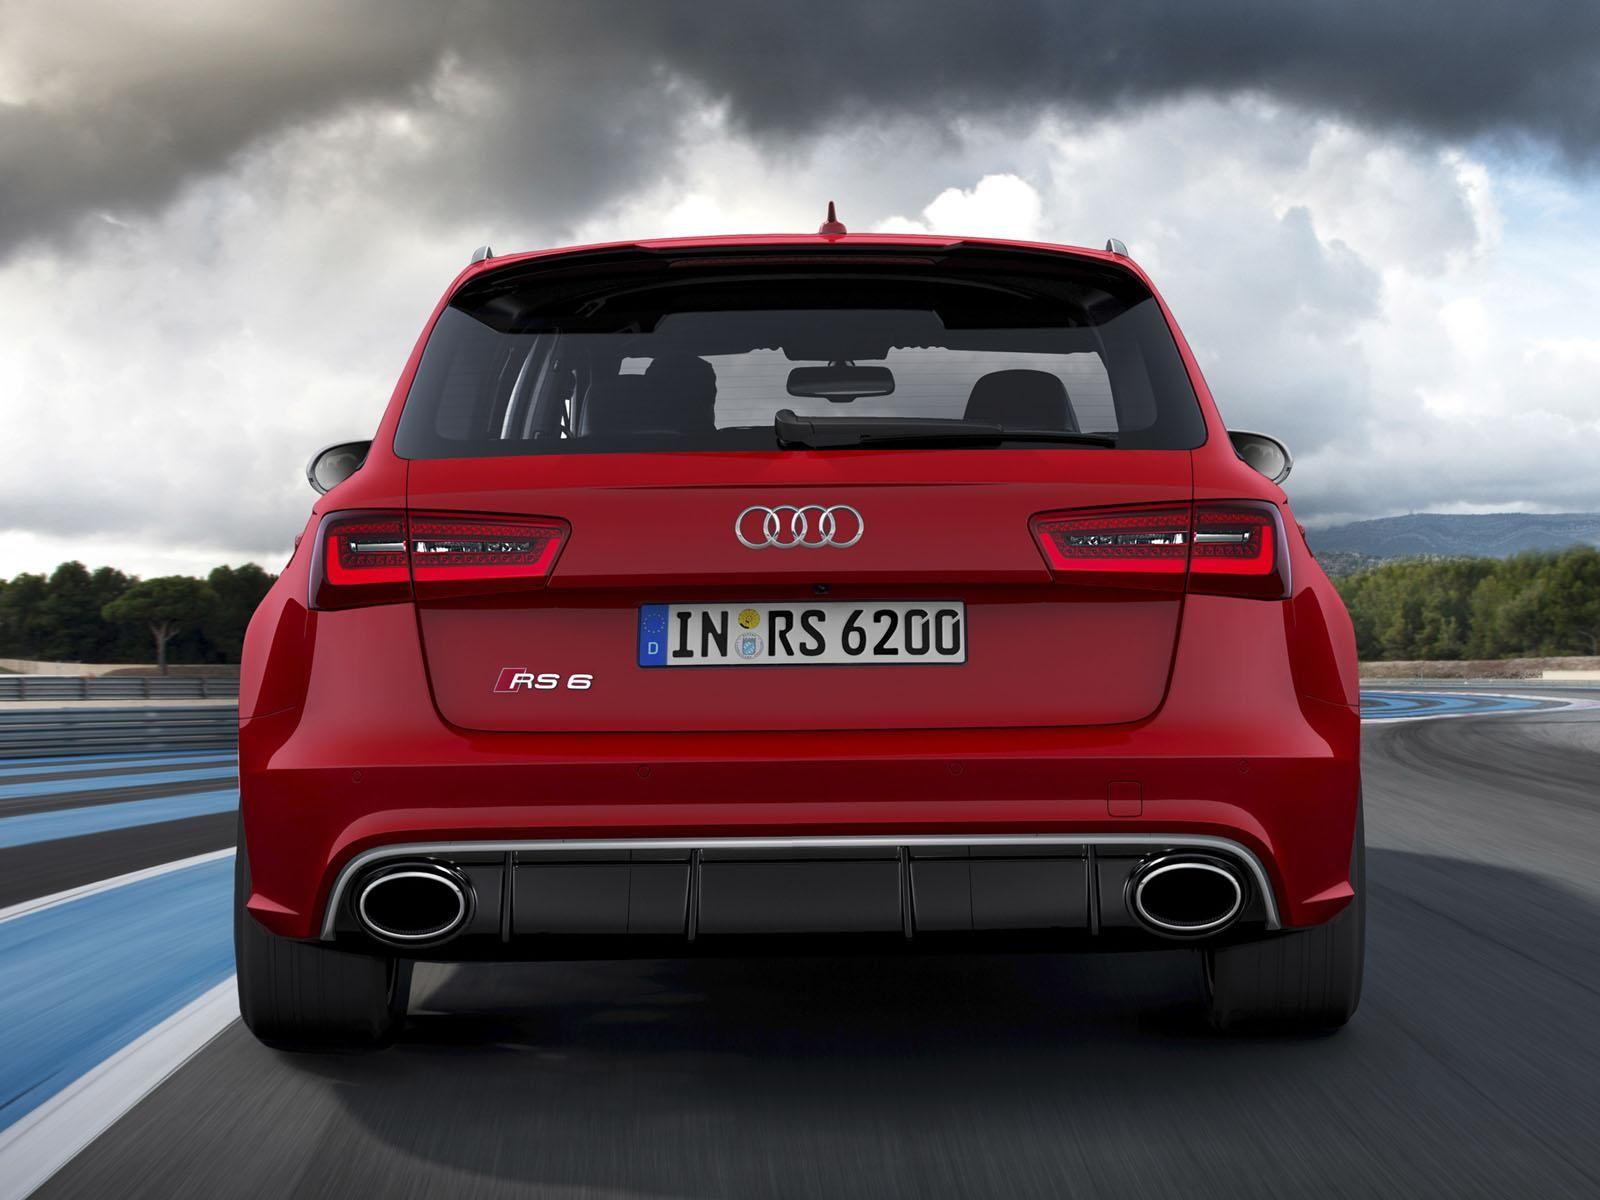 Audi rs6 avant 04 12 2012